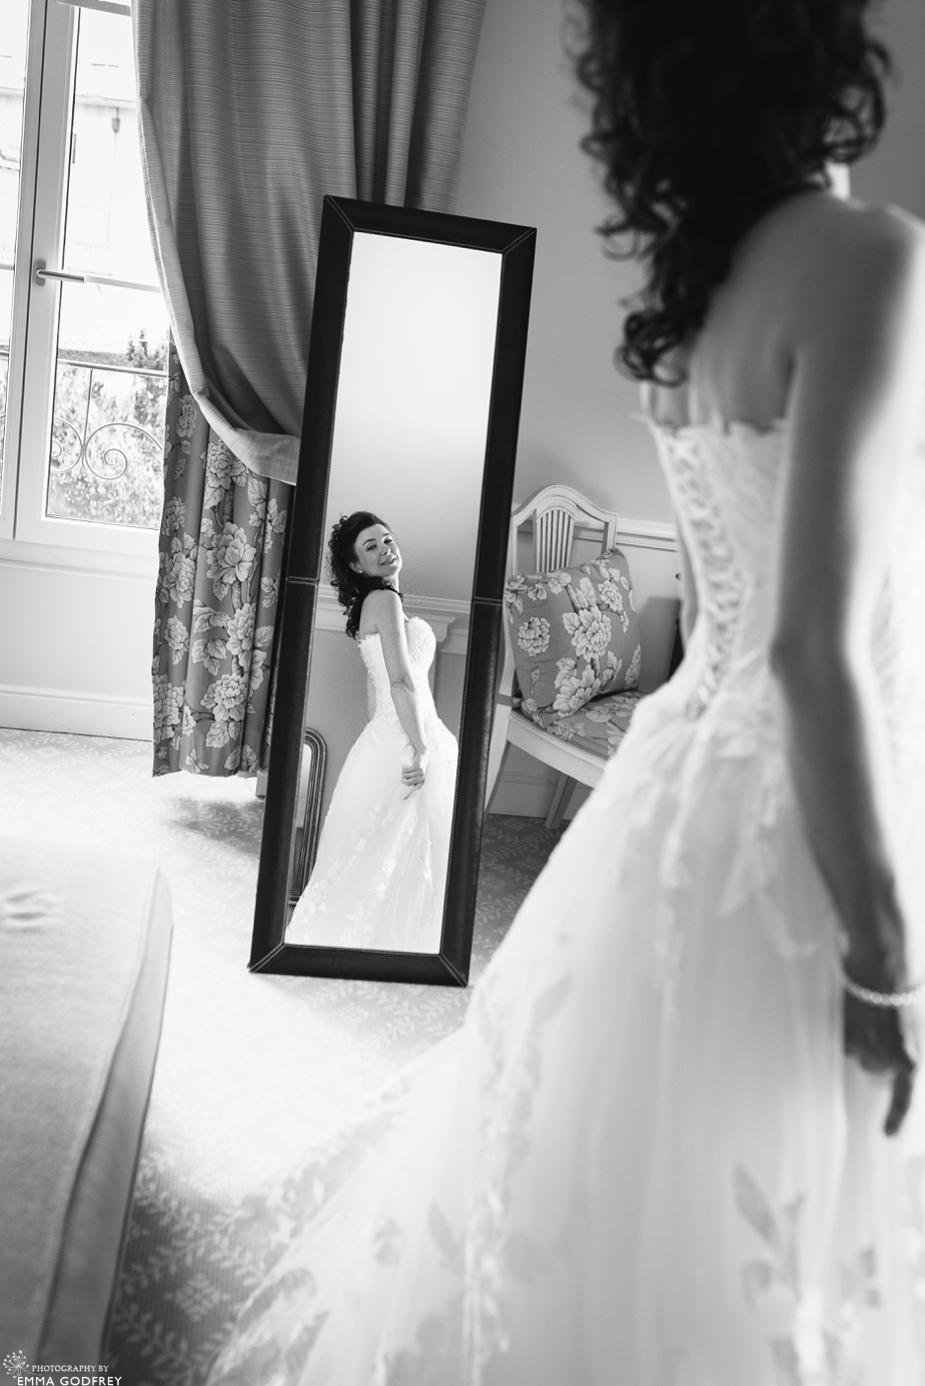 08-Swiss-Wedding-photographer-Vevey.jpg